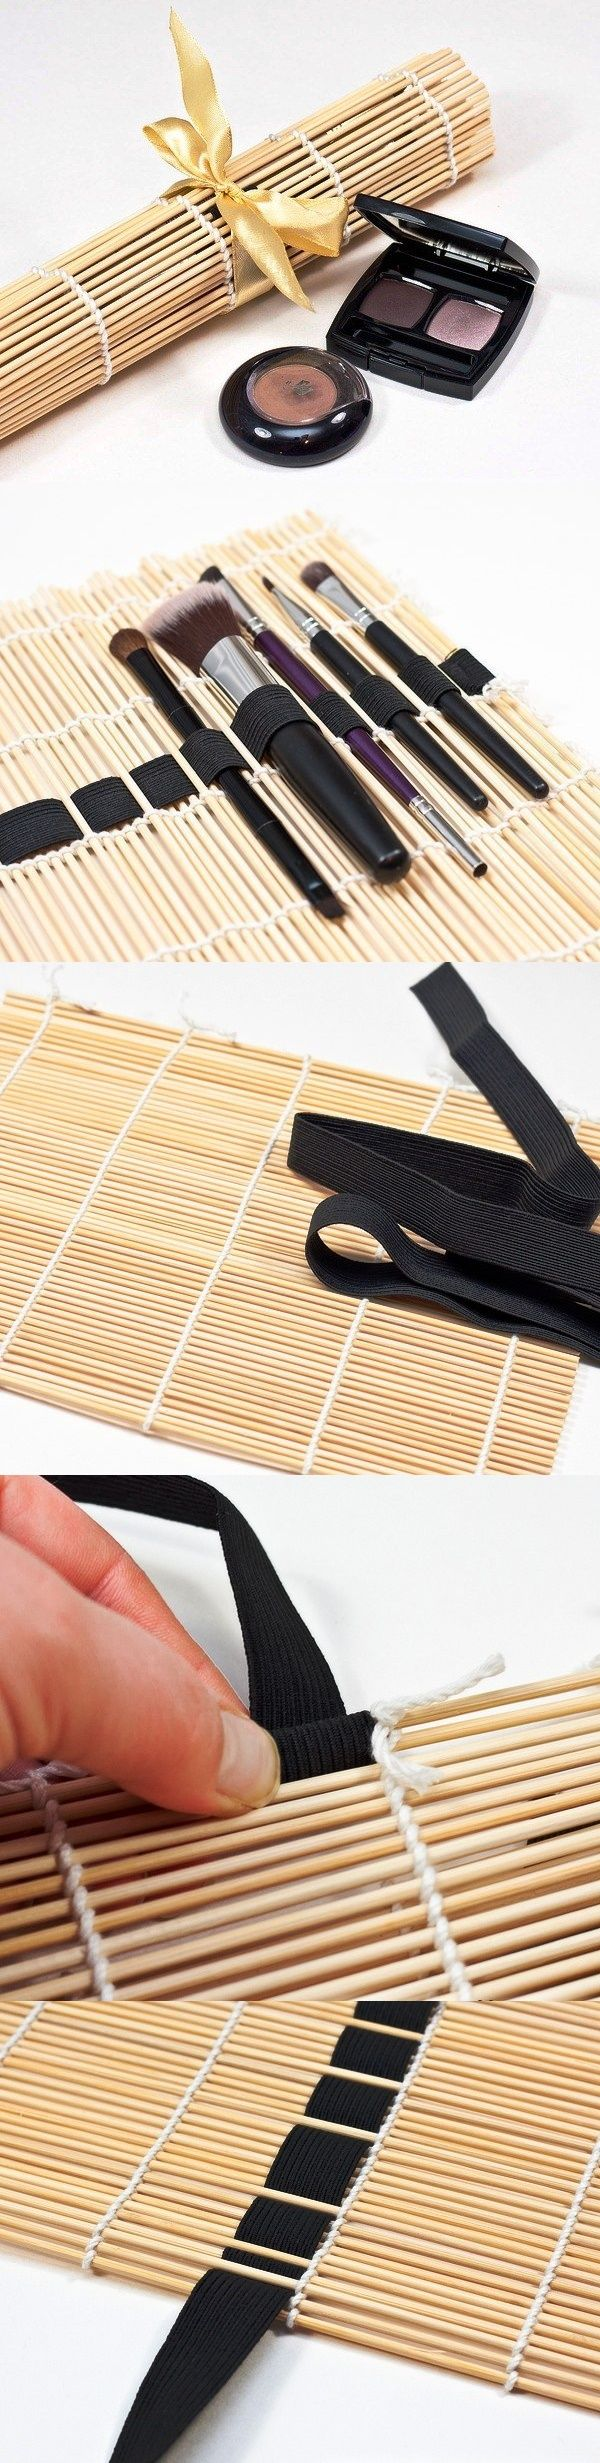 DIY Brush and swab holder